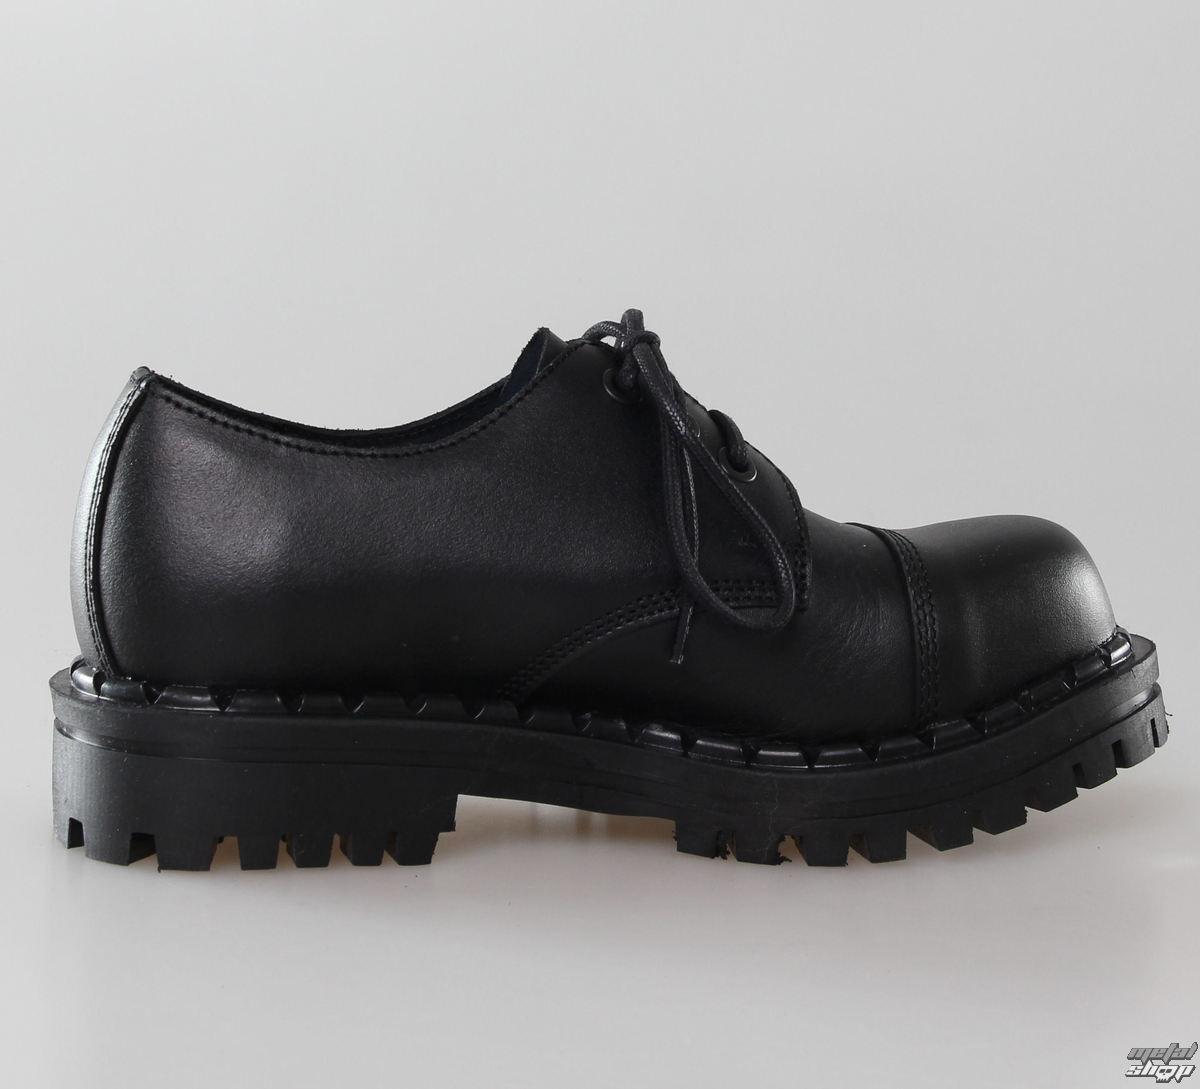 stiefel boots alter core 3 loch black gr e 41 ebay. Black Bedroom Furniture Sets. Home Design Ideas